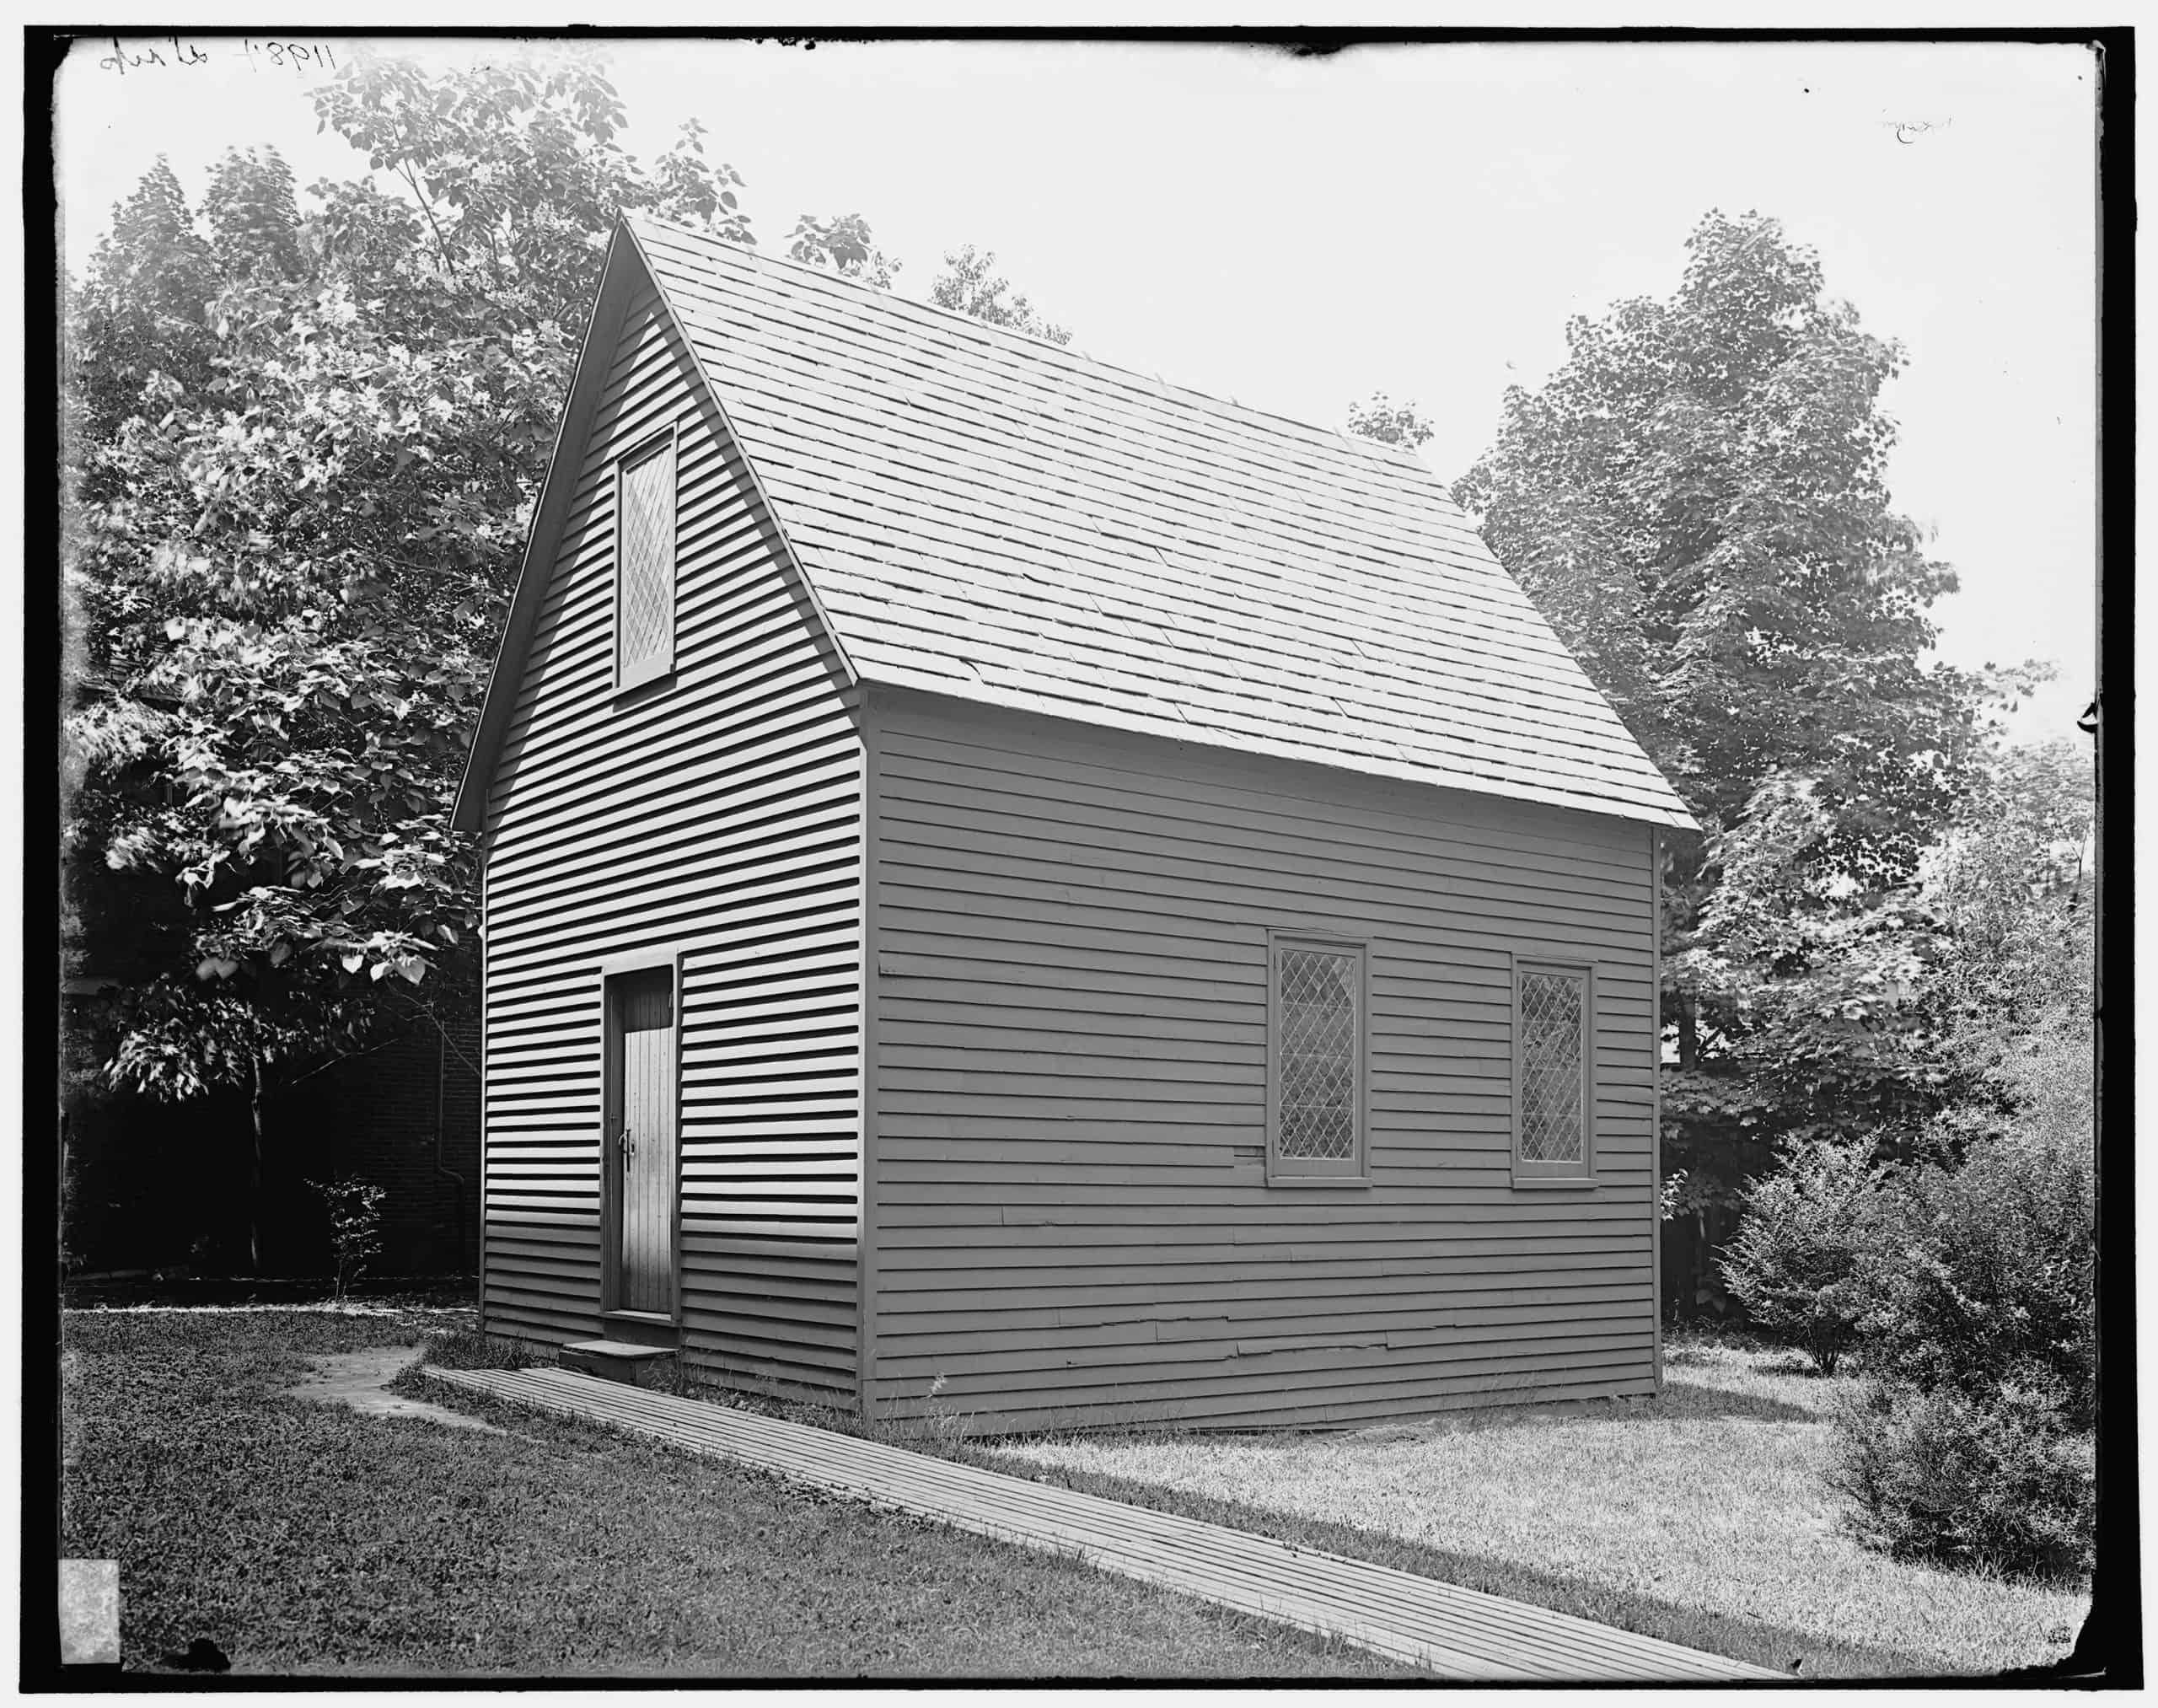 First Church, Salem, Mass. Detroit Publishing Co., between 1900 and 1906